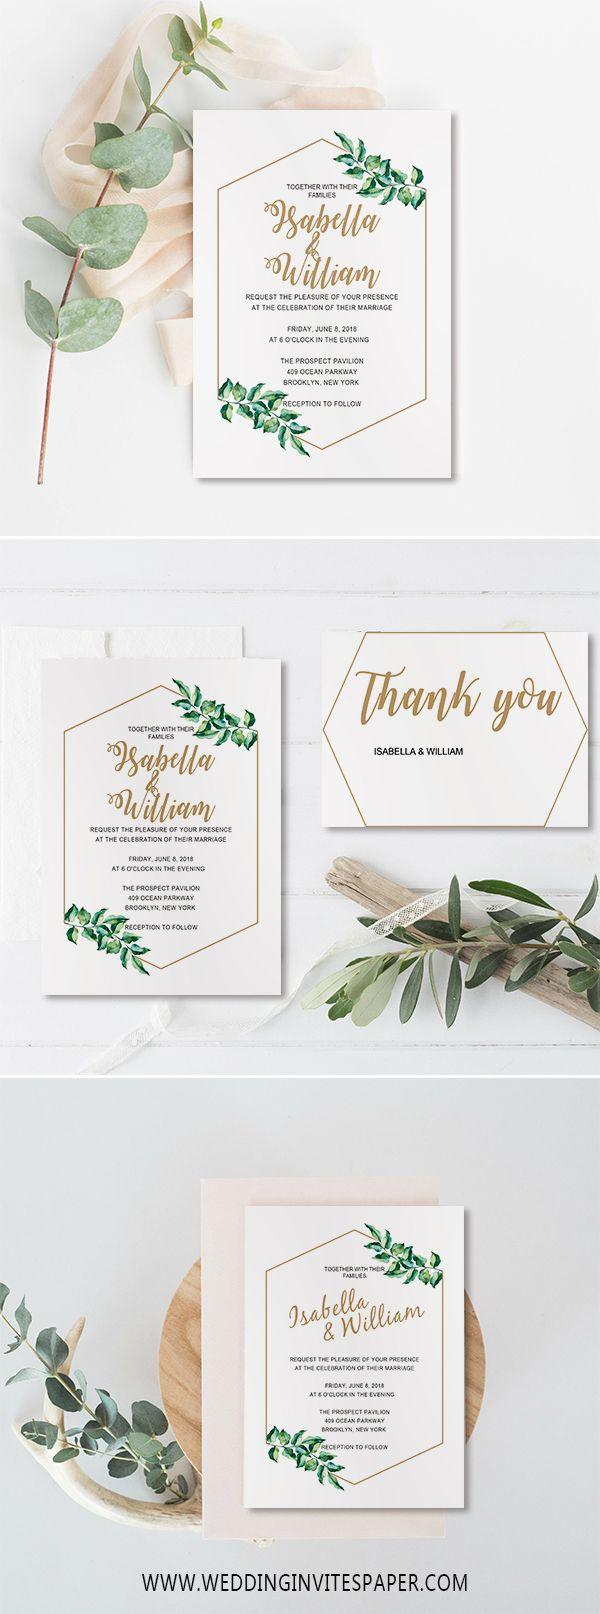 rustic chic wedding invitations/ elegant geometric green olive leaf wedding invitations